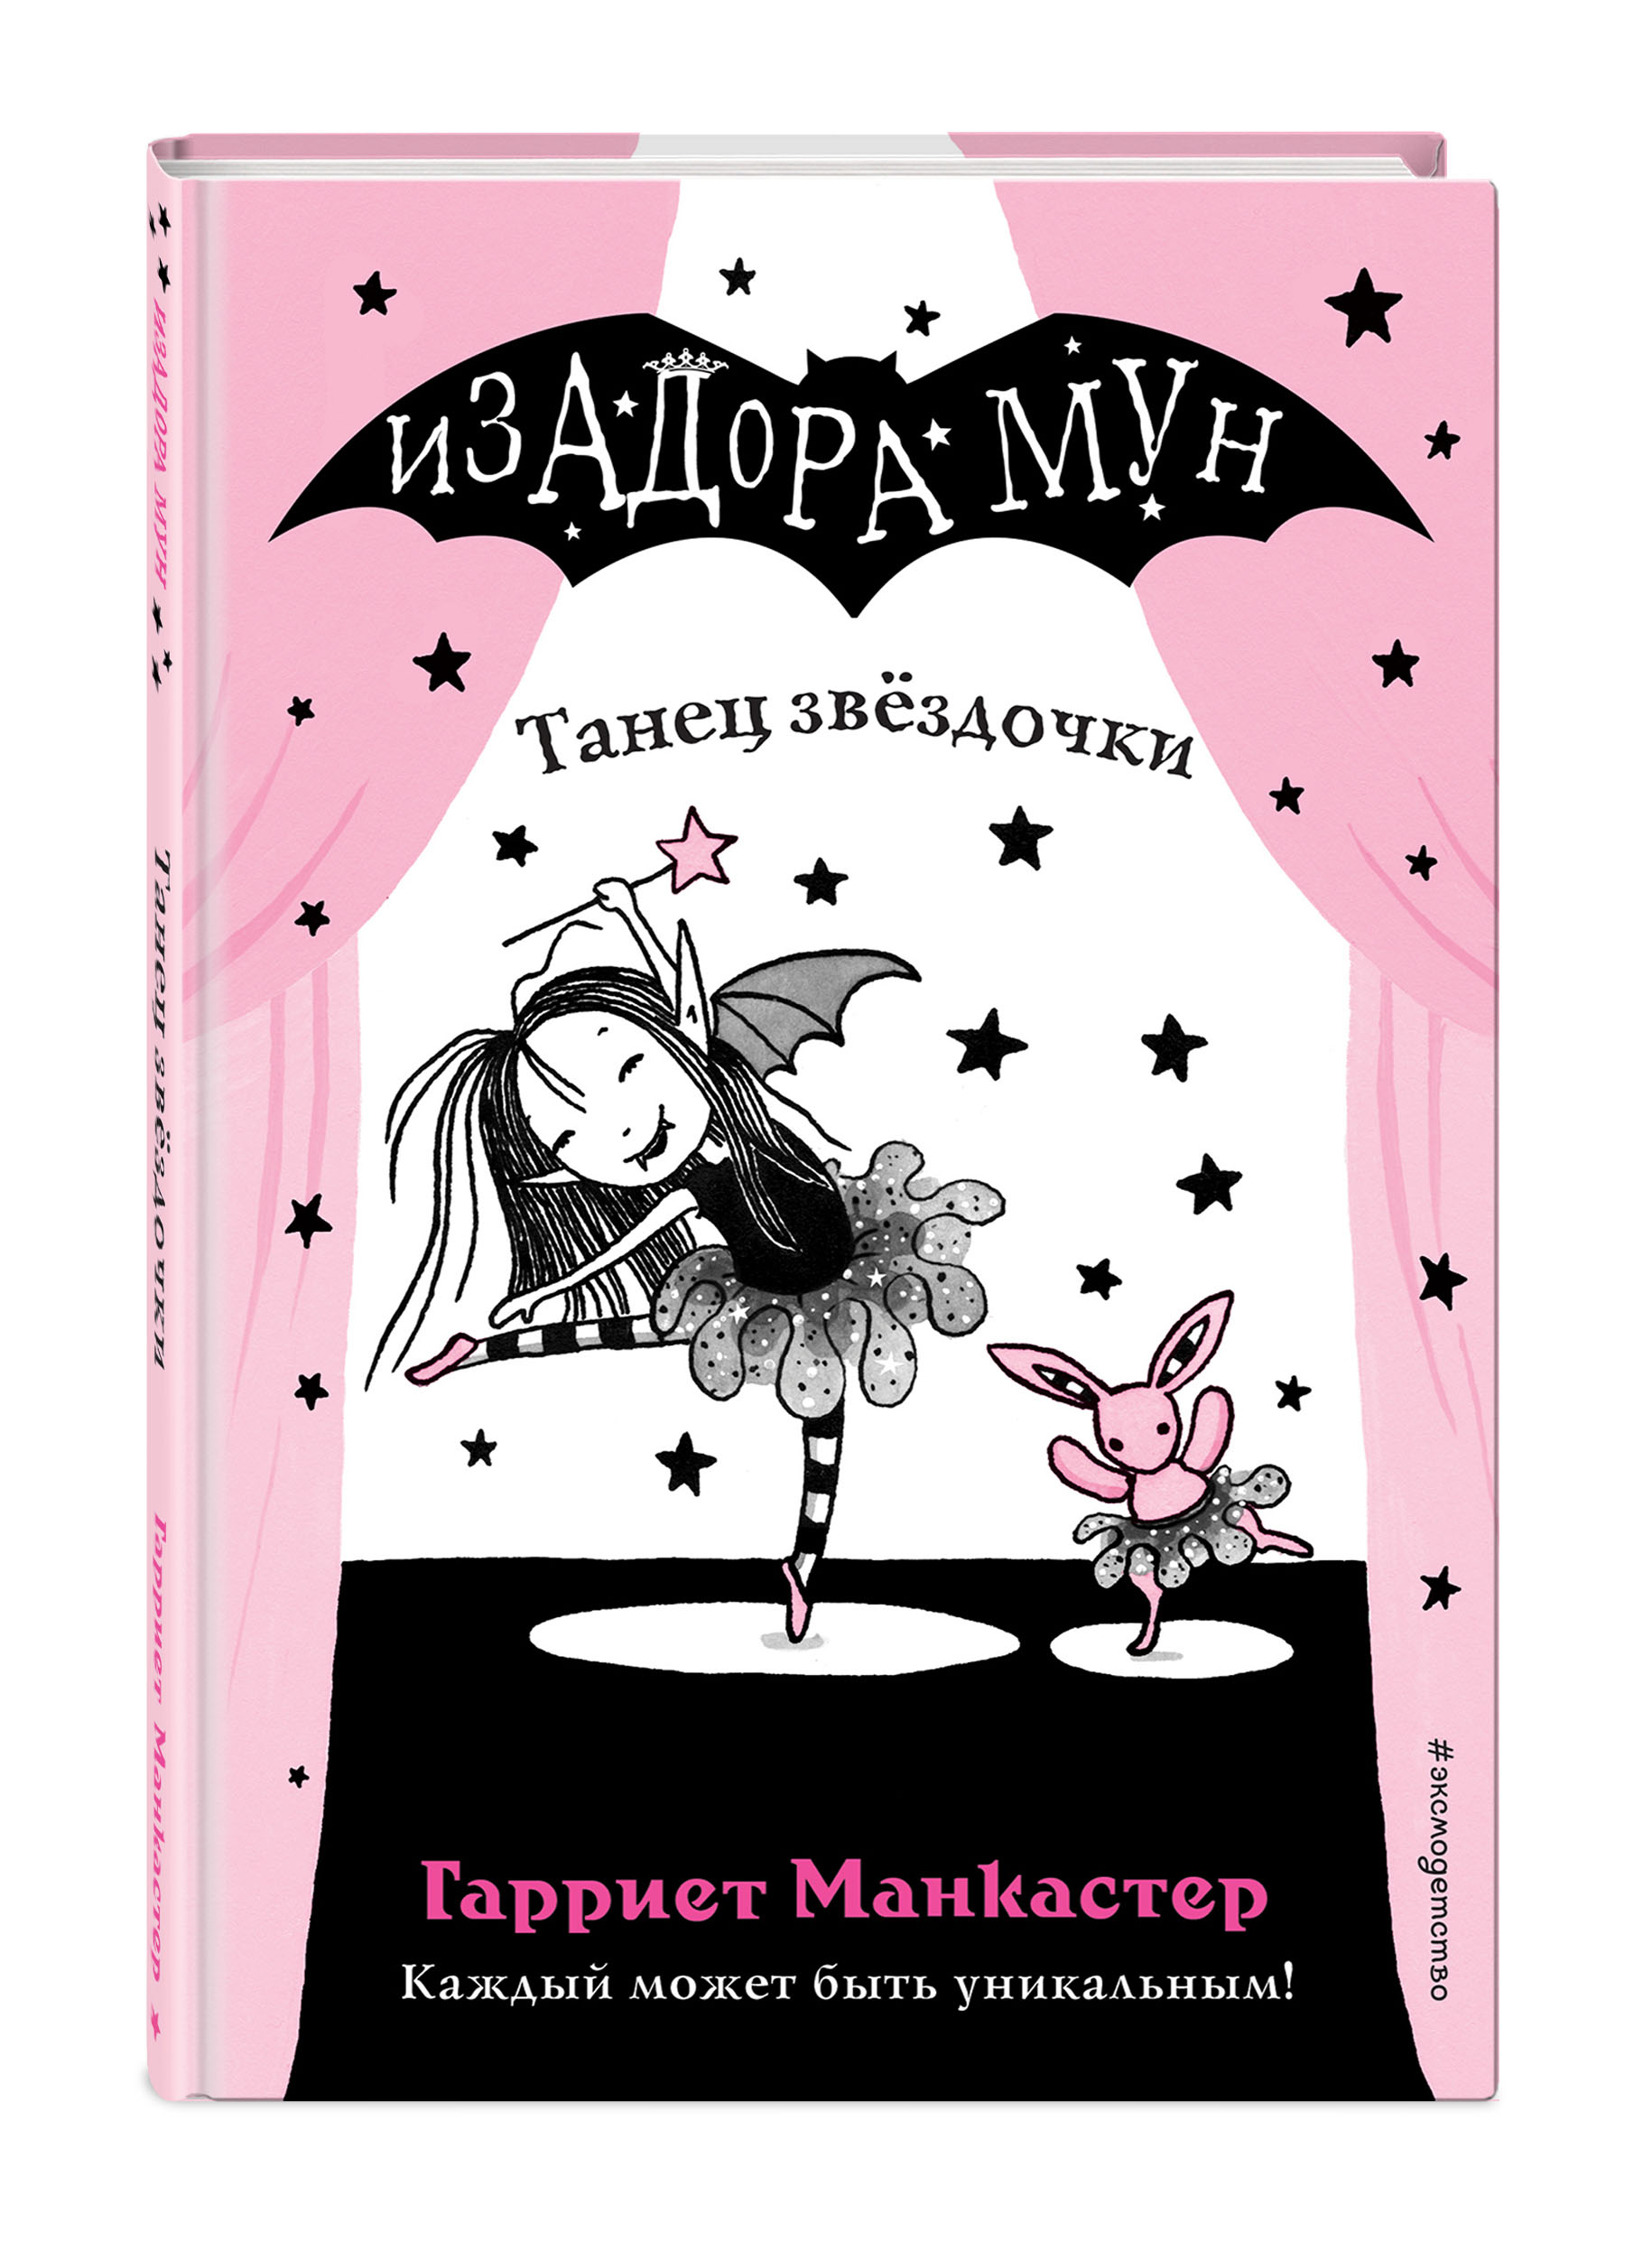 Кузнецова Д.Ю. Isadora Moon. Книга 6. (..)